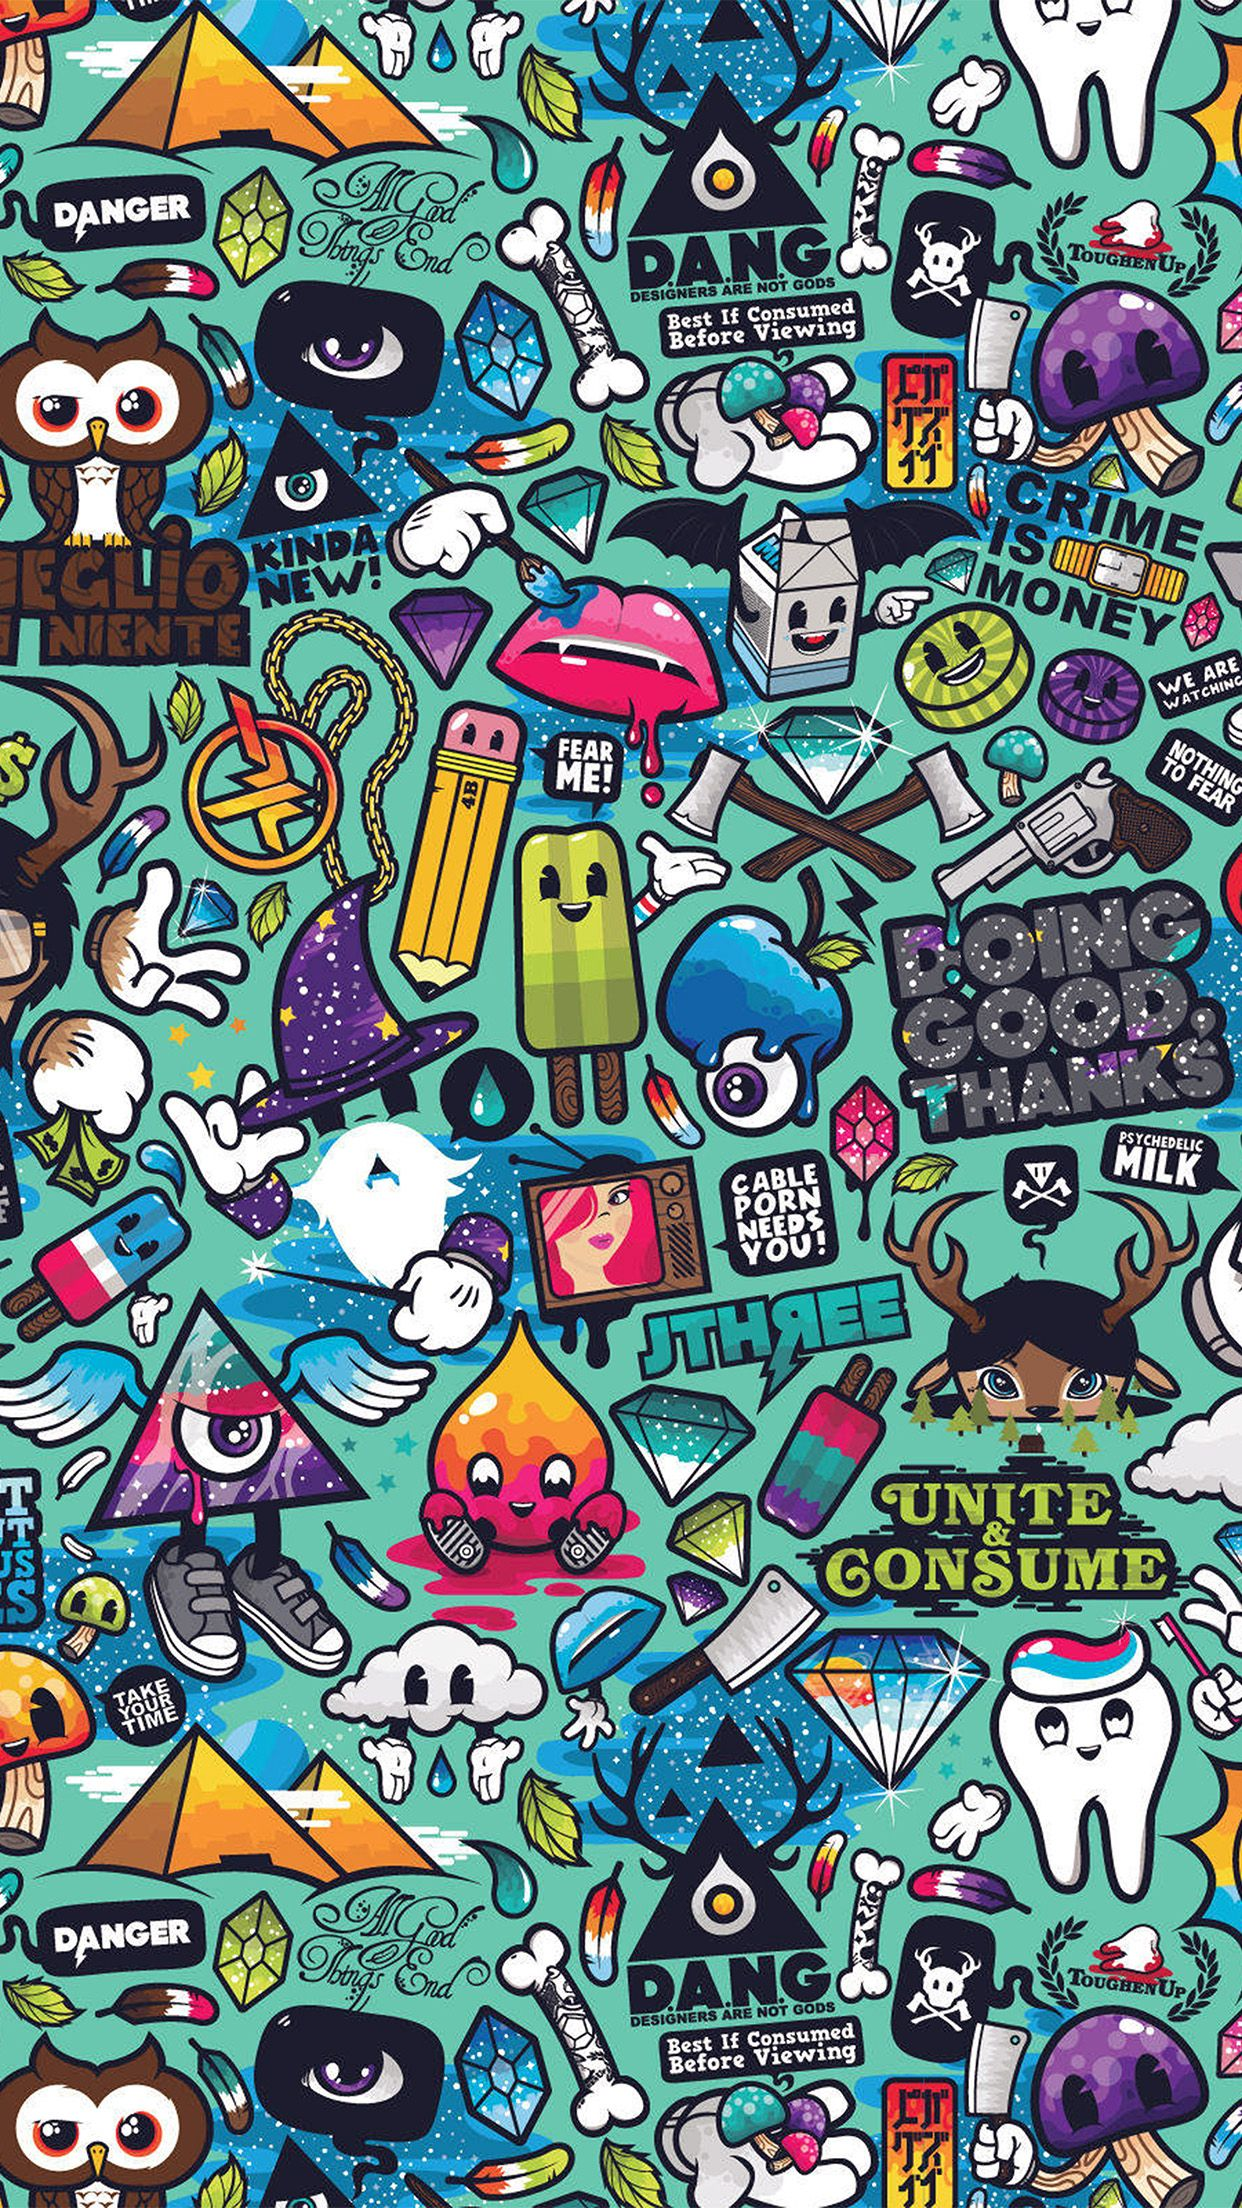 Gravity Falls Iphone 6 Plus Wallpaper Awesome Art Work Pattern Illustration Graffiti Iphone6